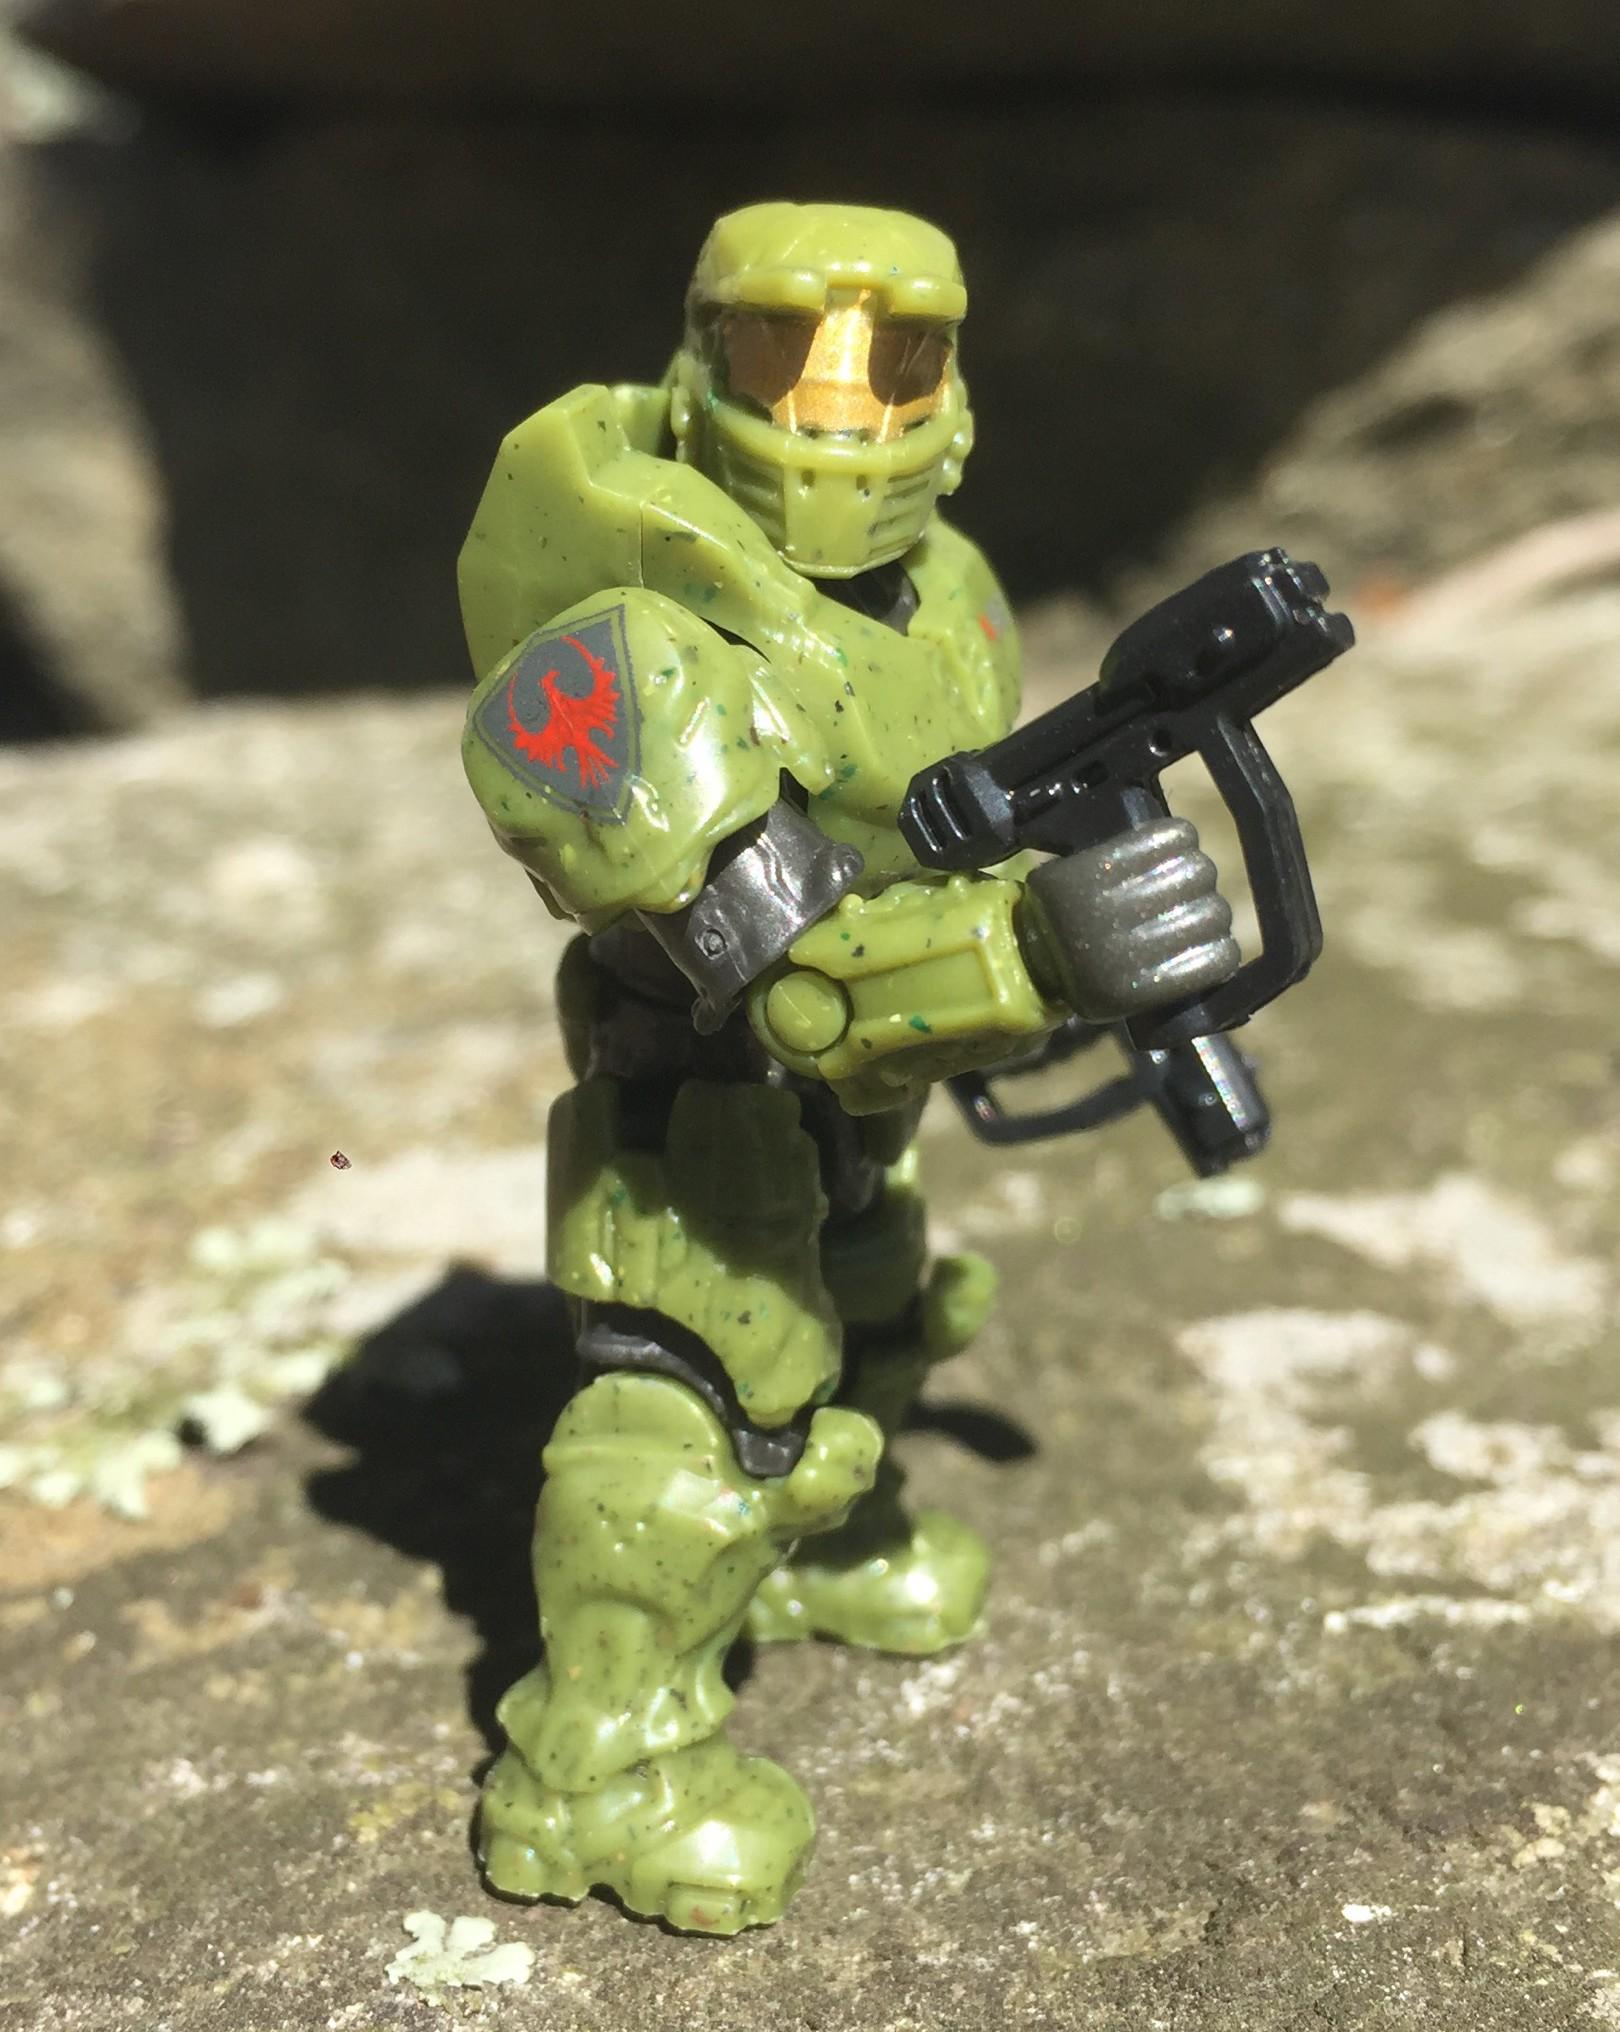 Mega Bloks Halo Wars 2 UNSC Jackrabbit Blitz Review - Halo